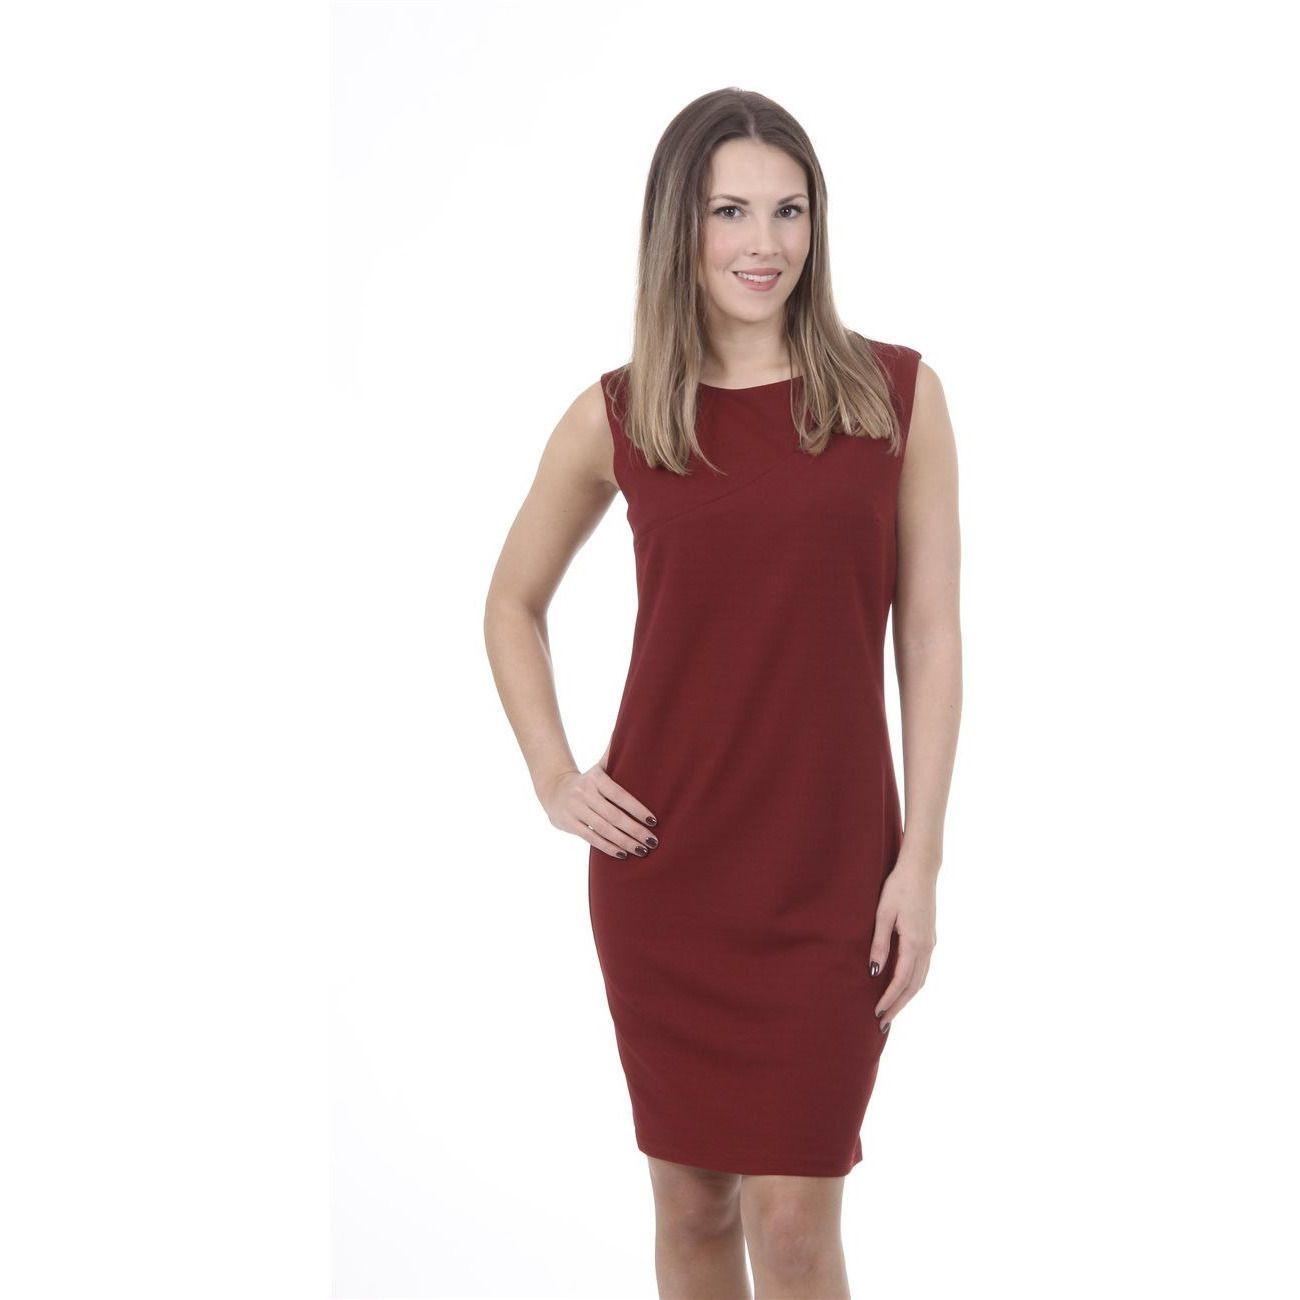 Versace 19.69 Abbigliamento Sportivo Srl Milano Italia Womens Dress ABITO VARDY TESS. SCUBA CREPE BORDEAUX